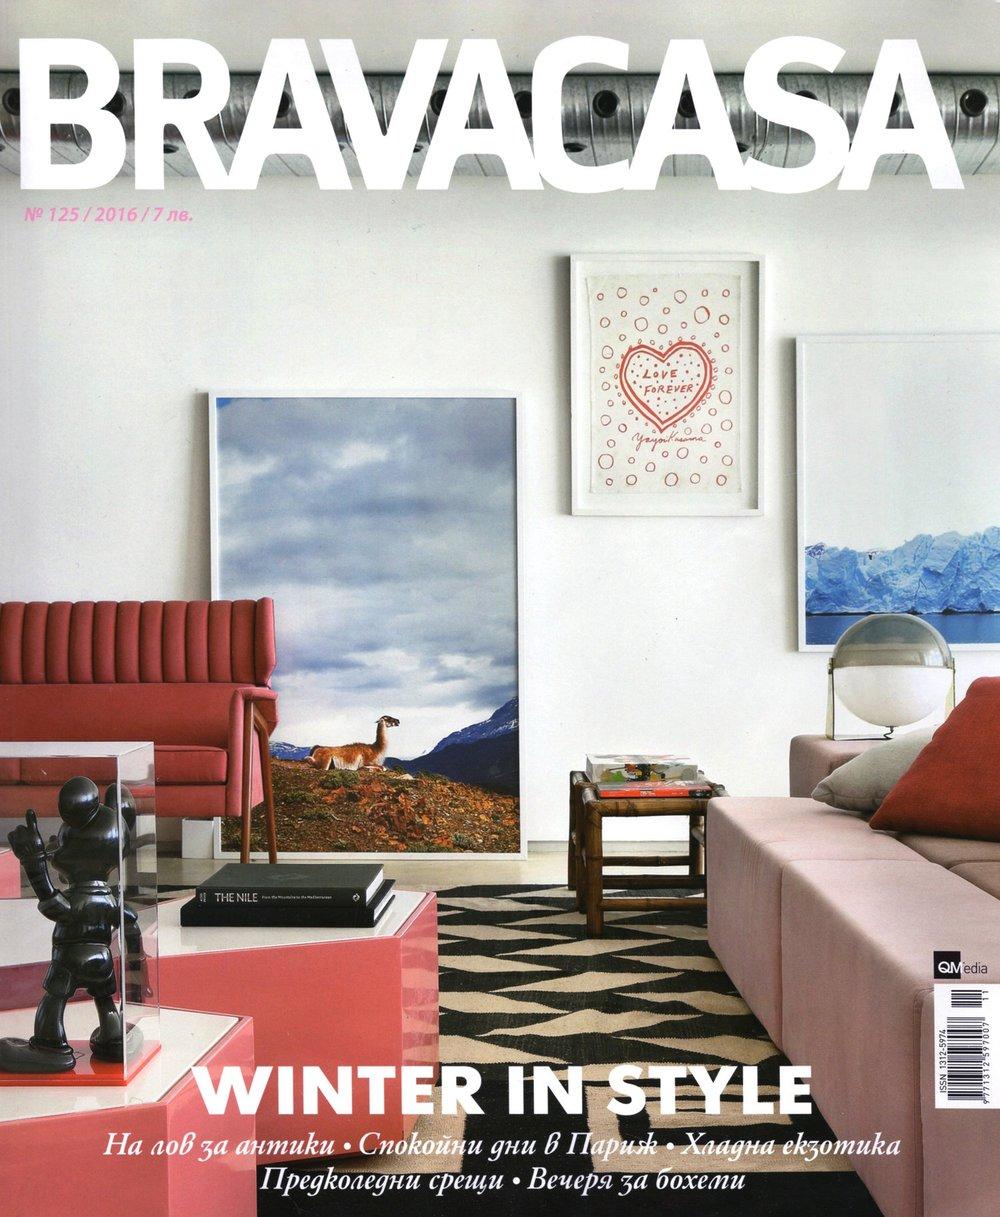 BRAVACASA MAGAZINE JULY 2016